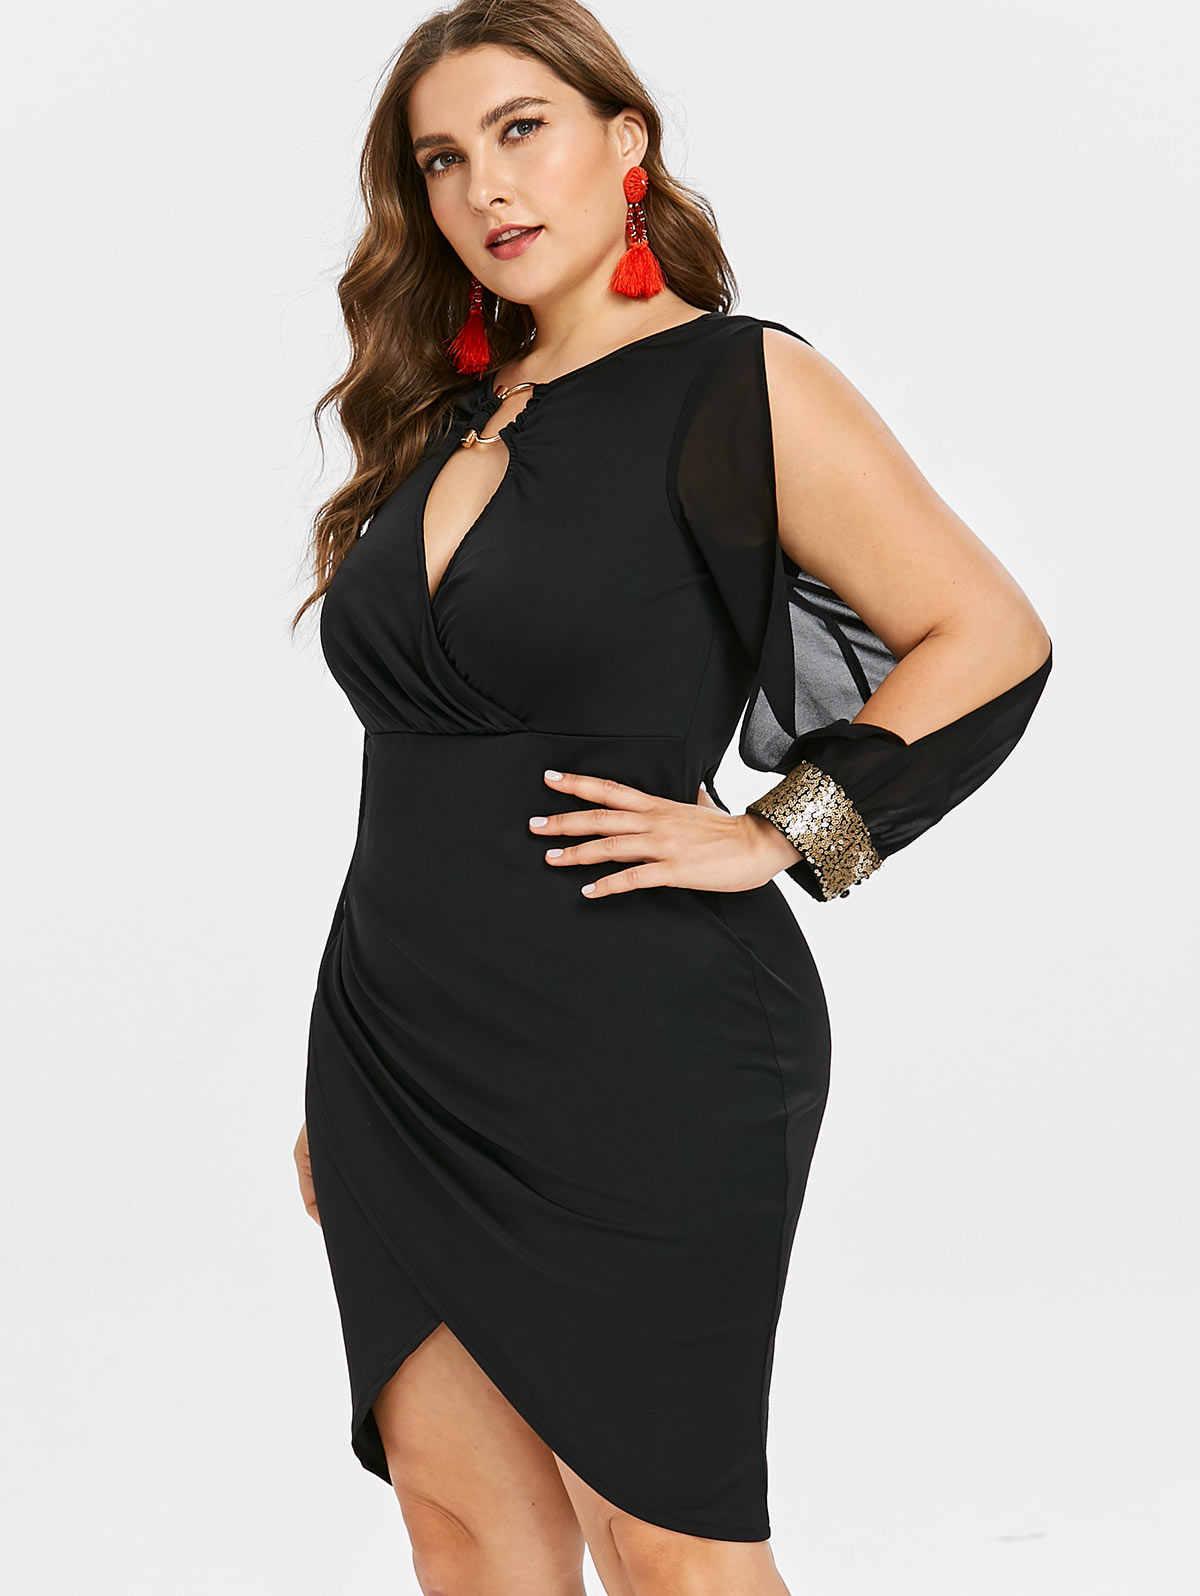 9829c9cd4f5 ... Wipalo Slit Sleeve Plus Size O-Ring Sequin Embellished Bodycon Dress  Elegant Solid Slip Front ...